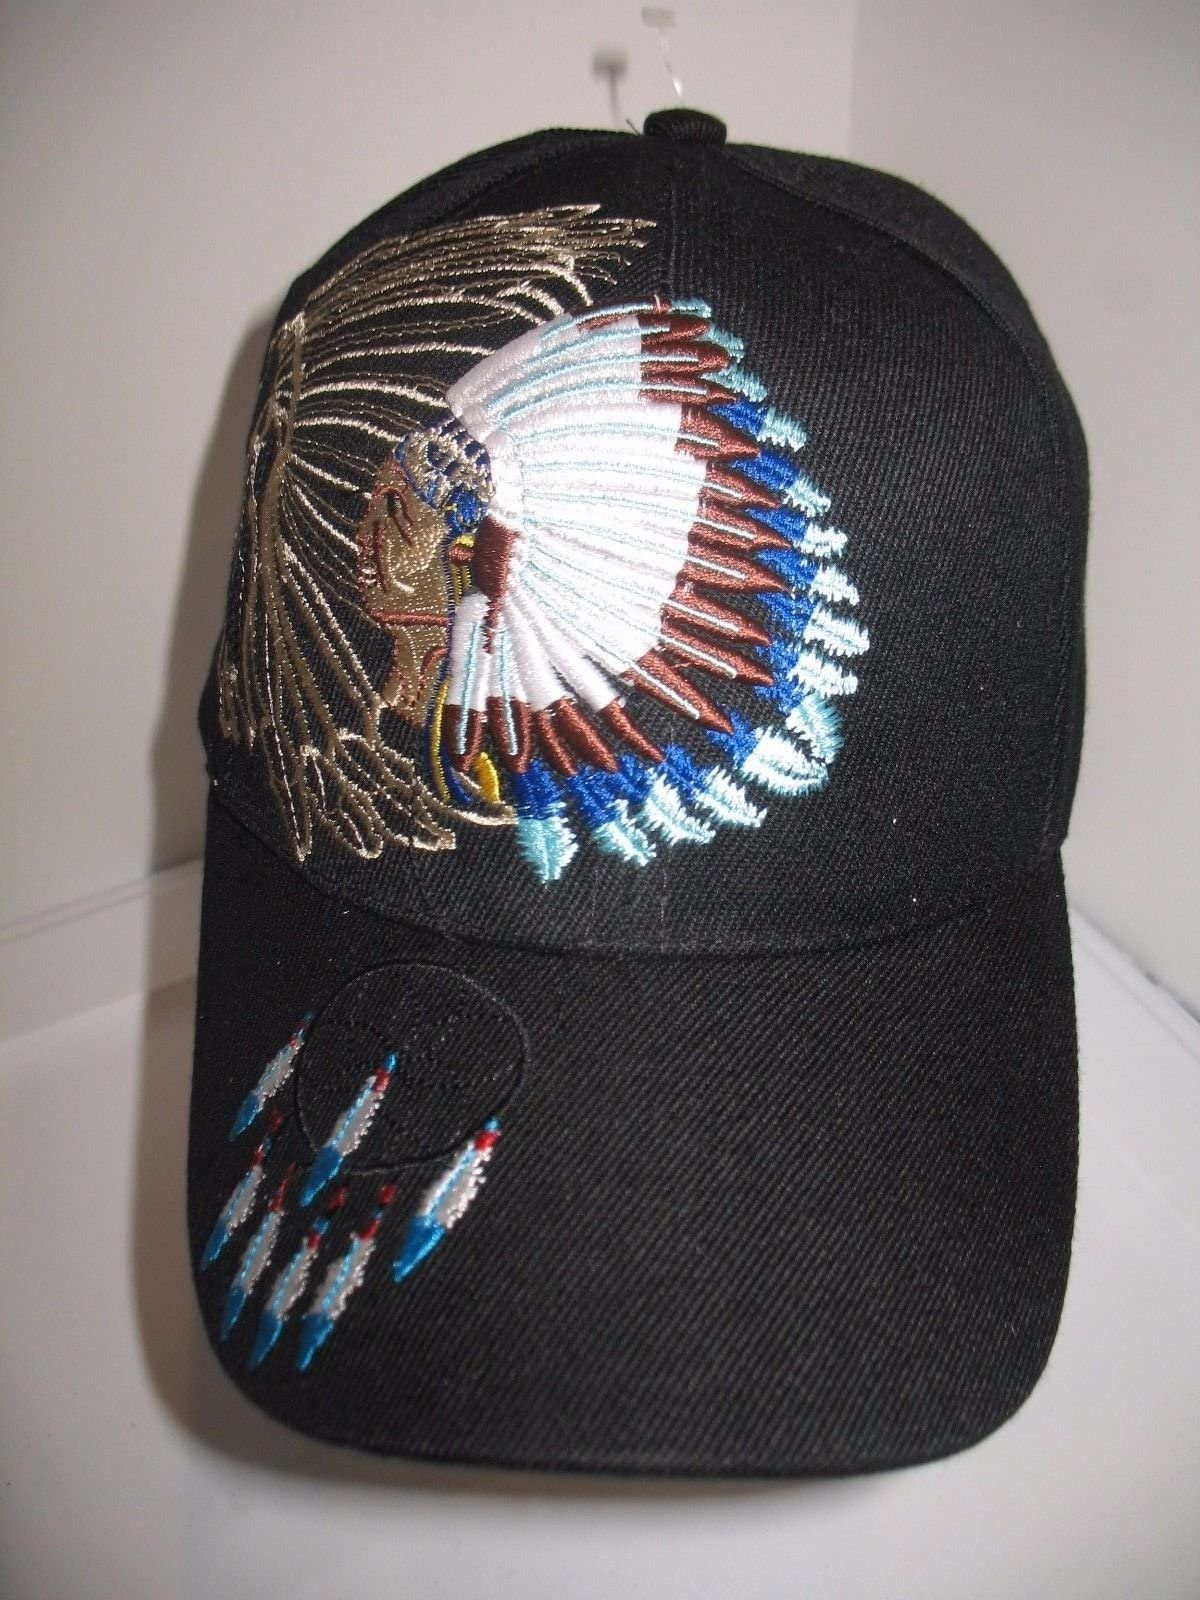 Vintage hat cycling Team FESTINA Rossin Retro Cycling Hat Cap